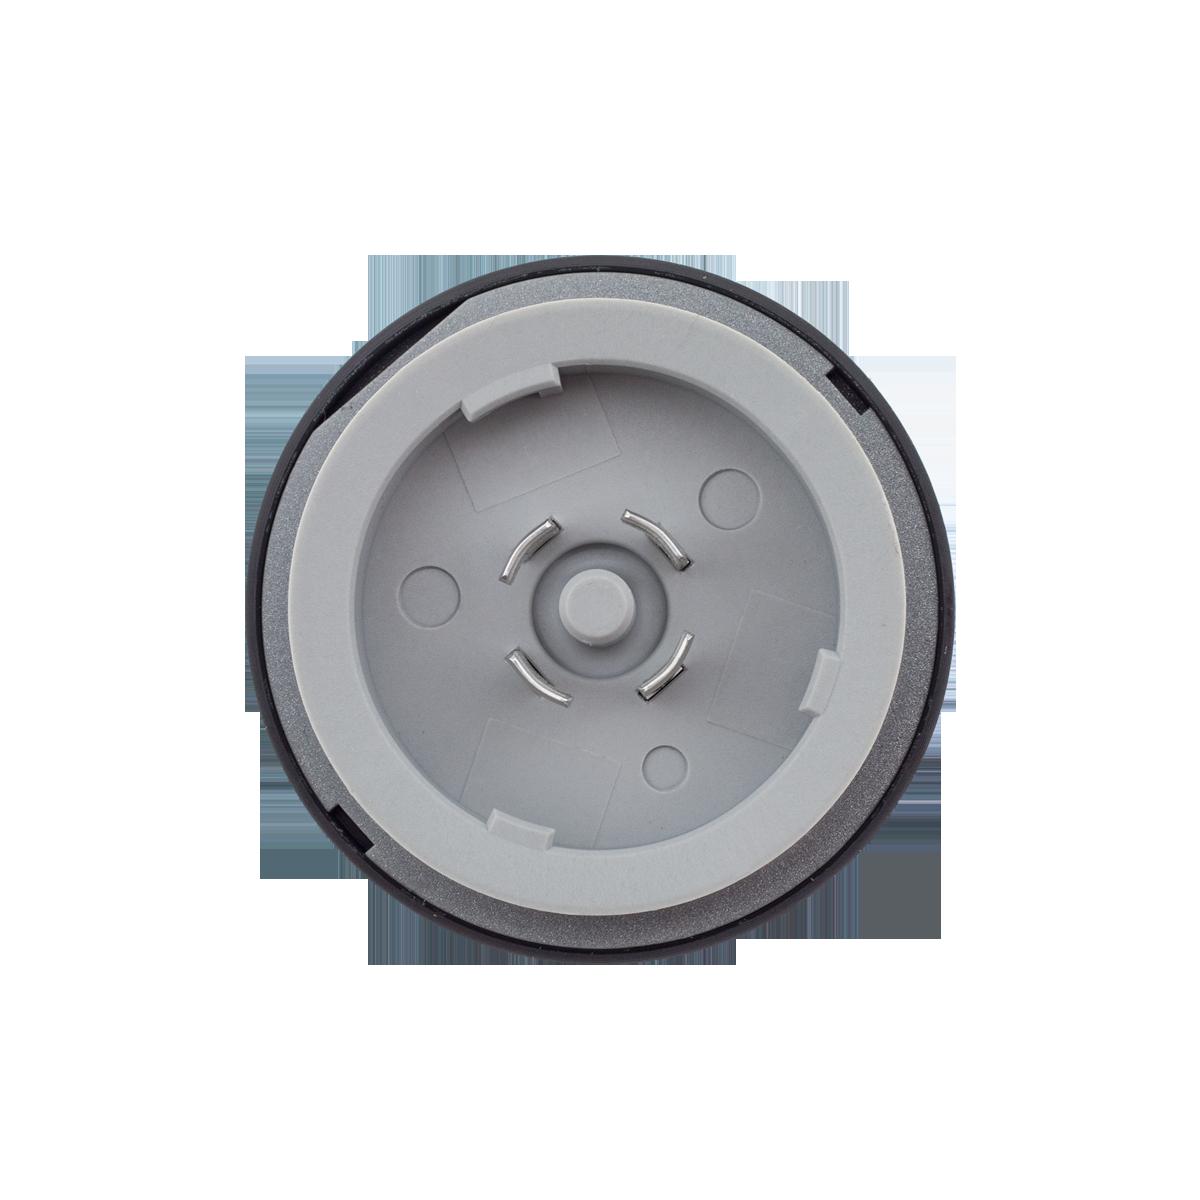 NB-IoT/ LTE-M Luminaire Controller Zhaga® 18